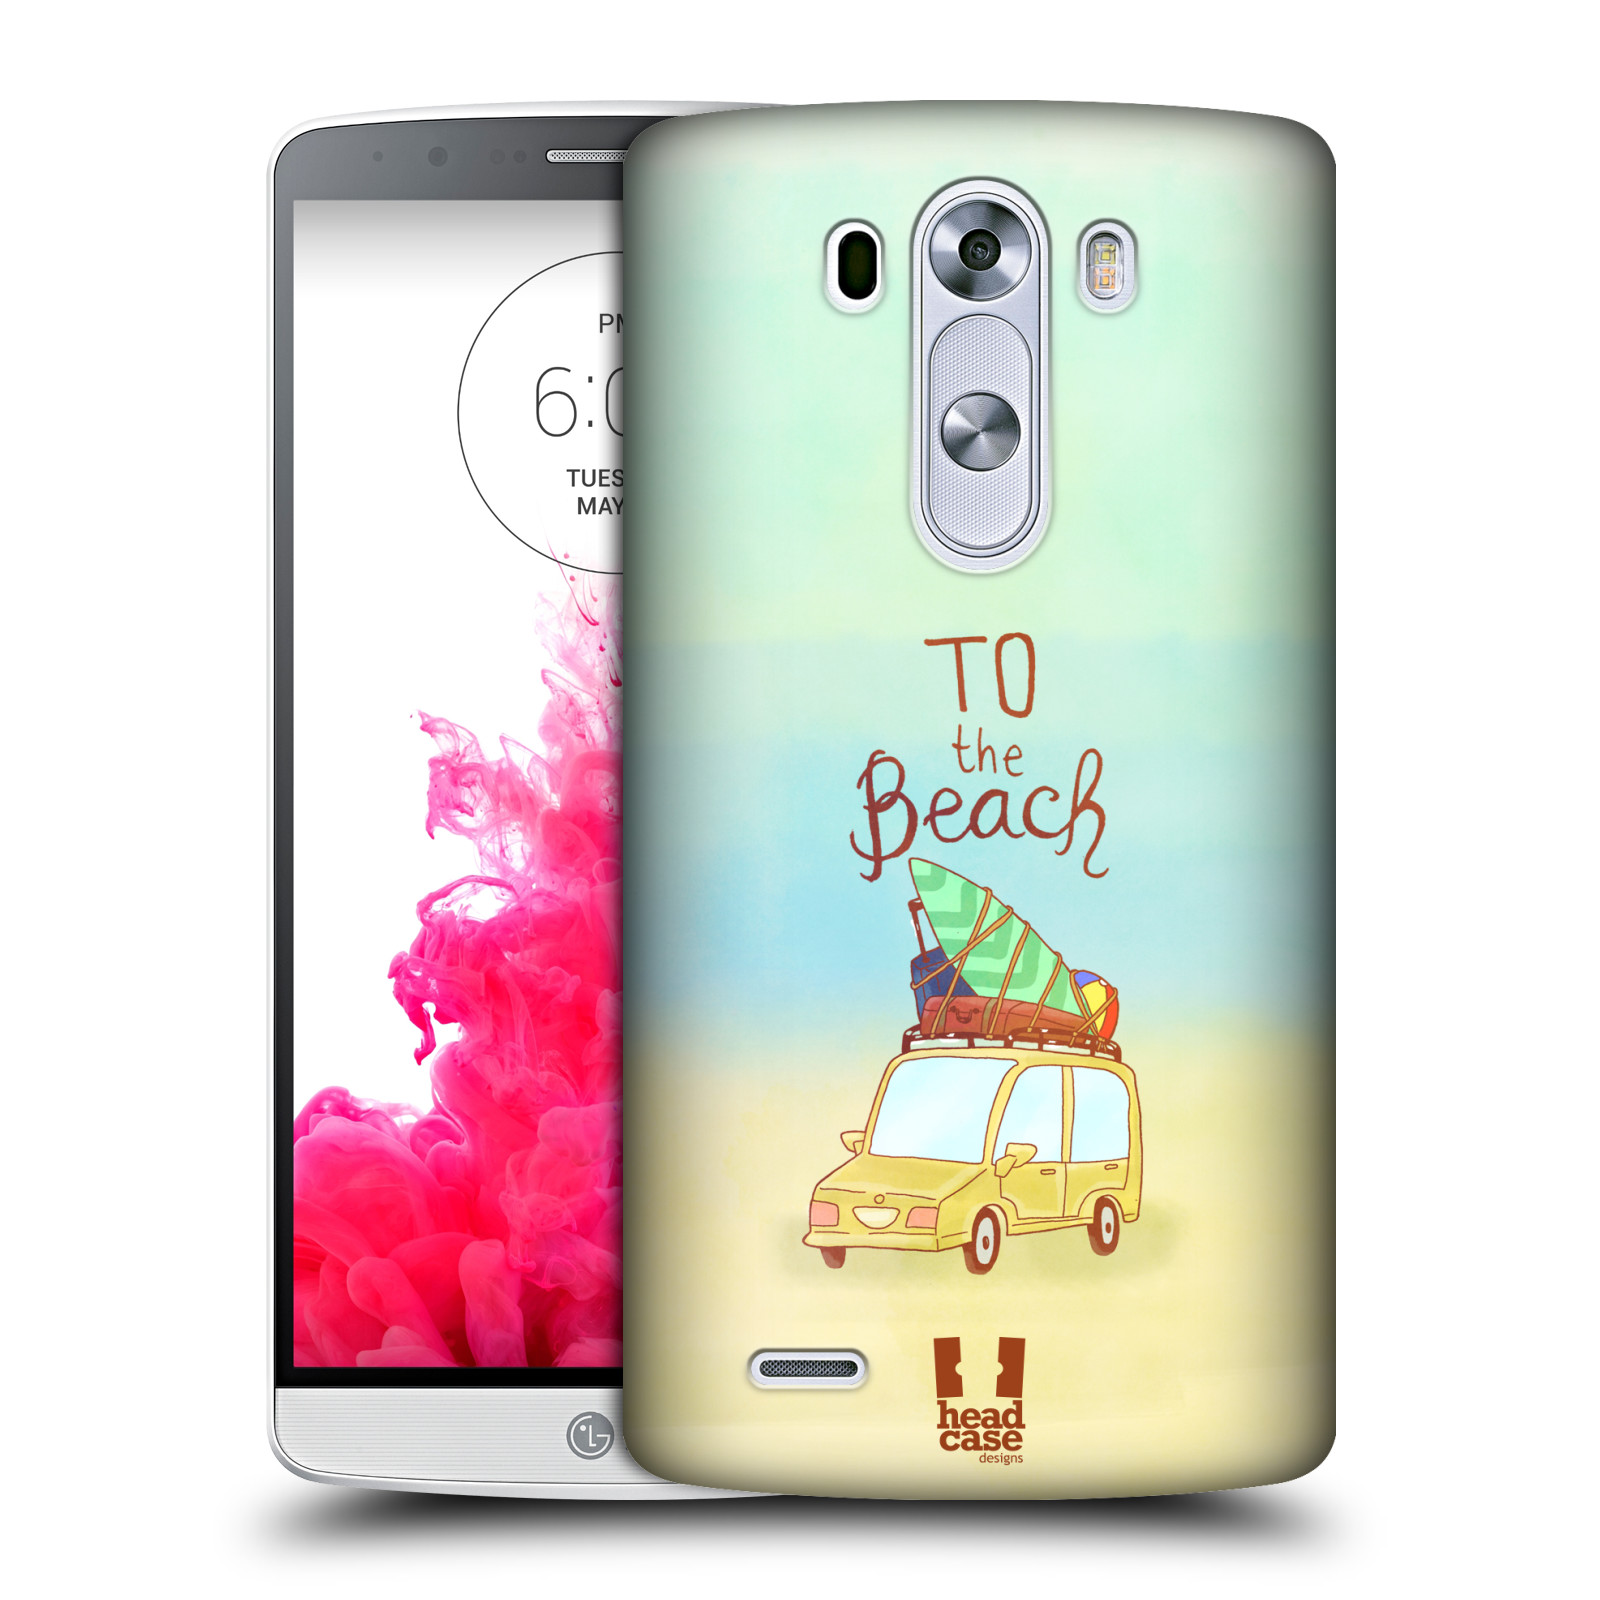 HEAD-CASE-DESIGNS-SUMMER-SEASON-HARD-BACK-CASE-FOR-LG-PHONES-1